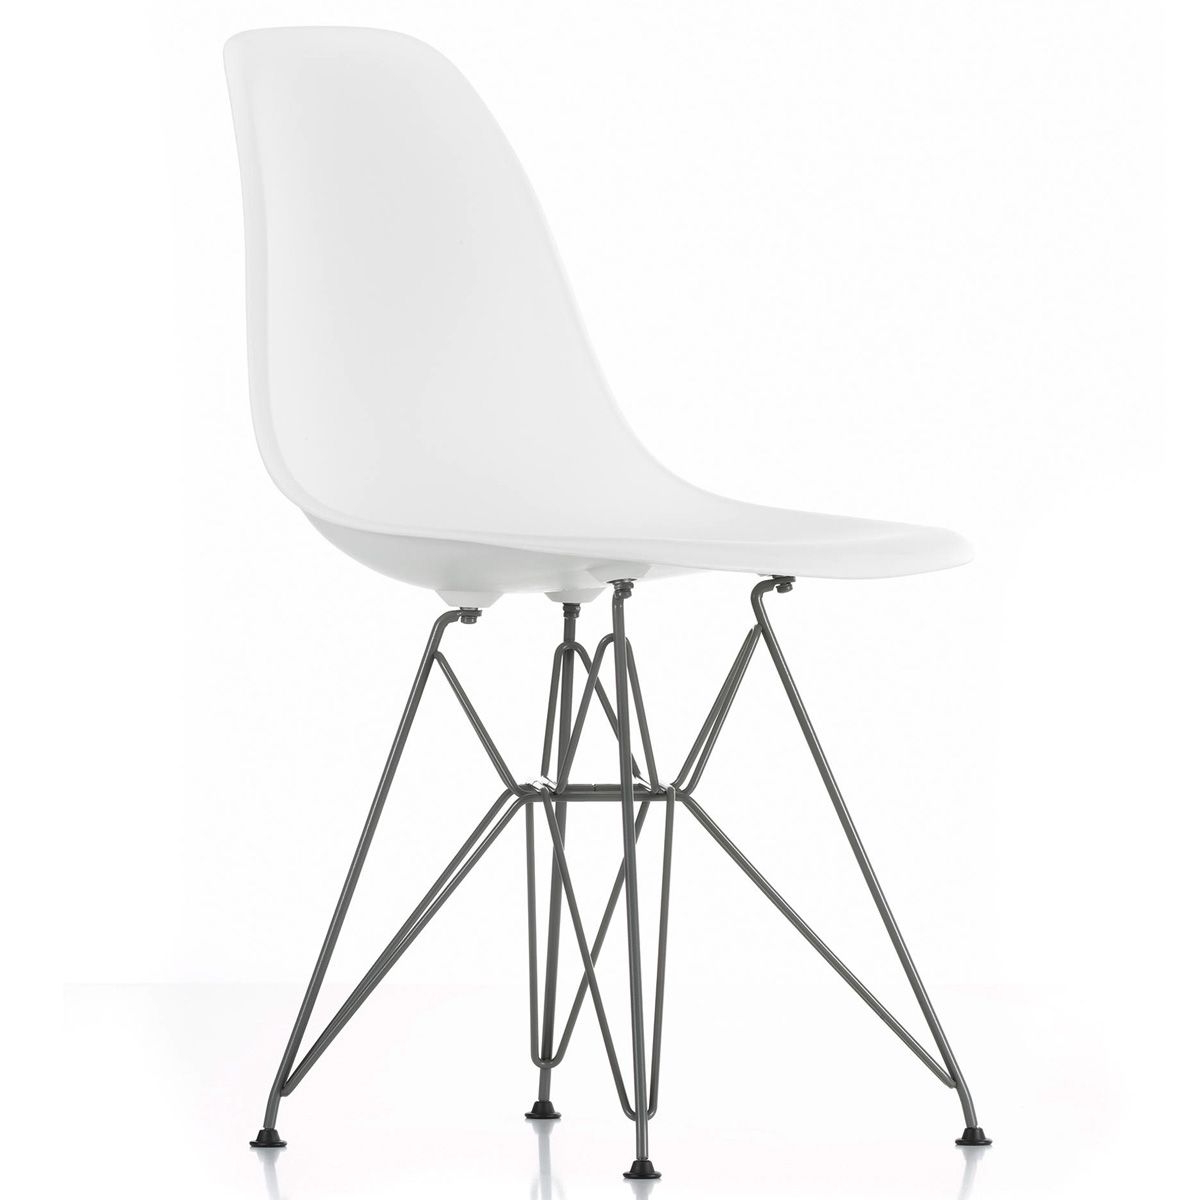 Eames Silla E6d5 original Eames Plastic Dsr Chair by Vitra In Naharro